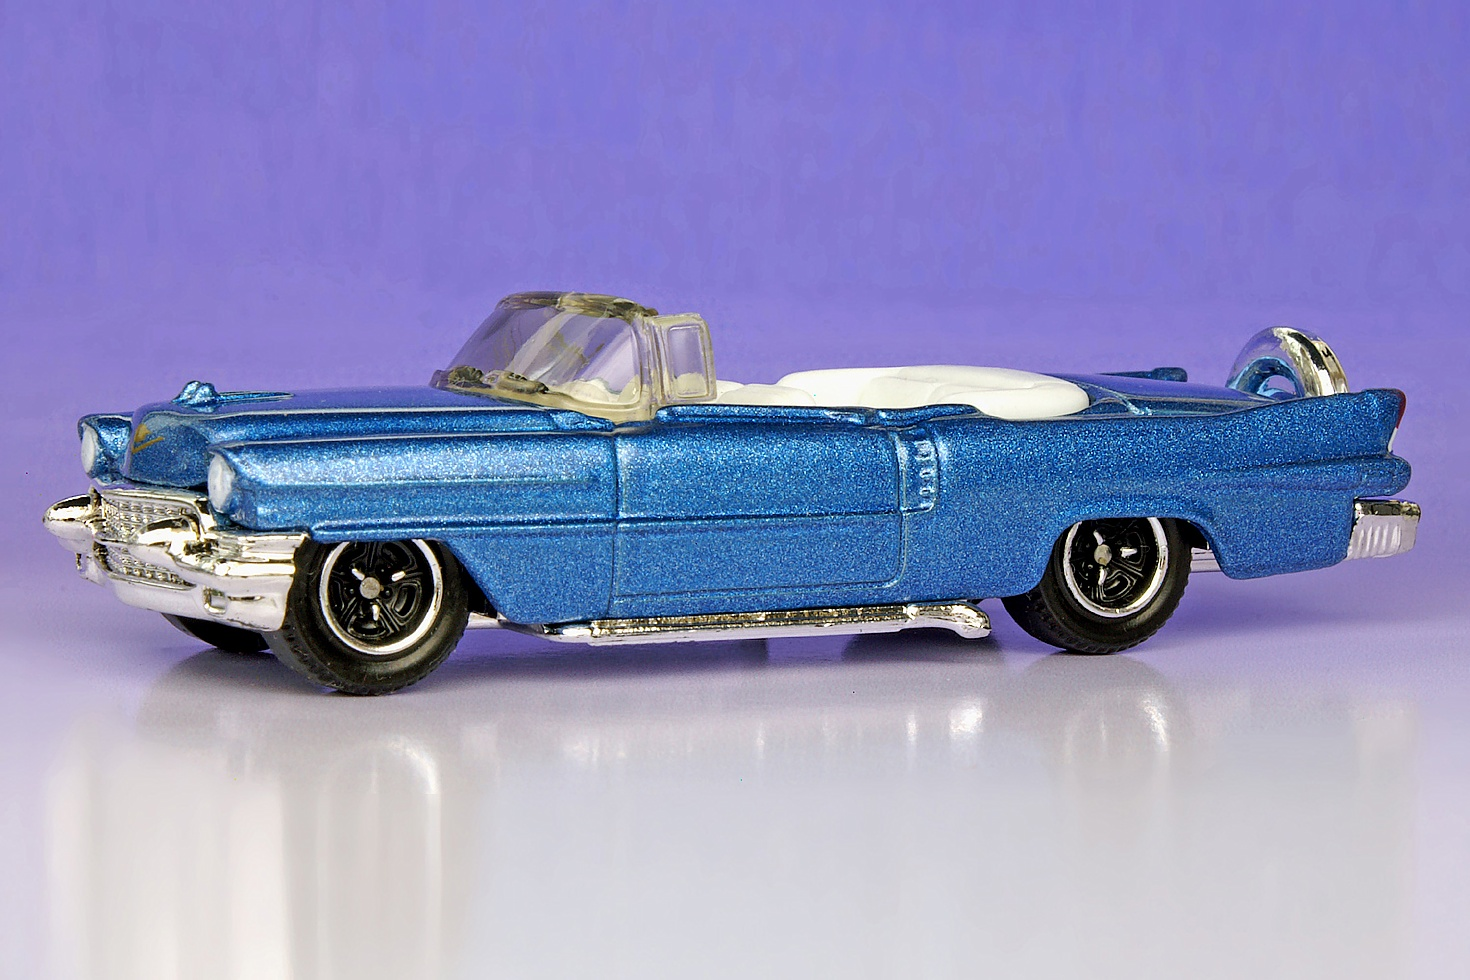 1956 Cadillac Eldorado | Matchbox Cars Wiki | FANDOM ...